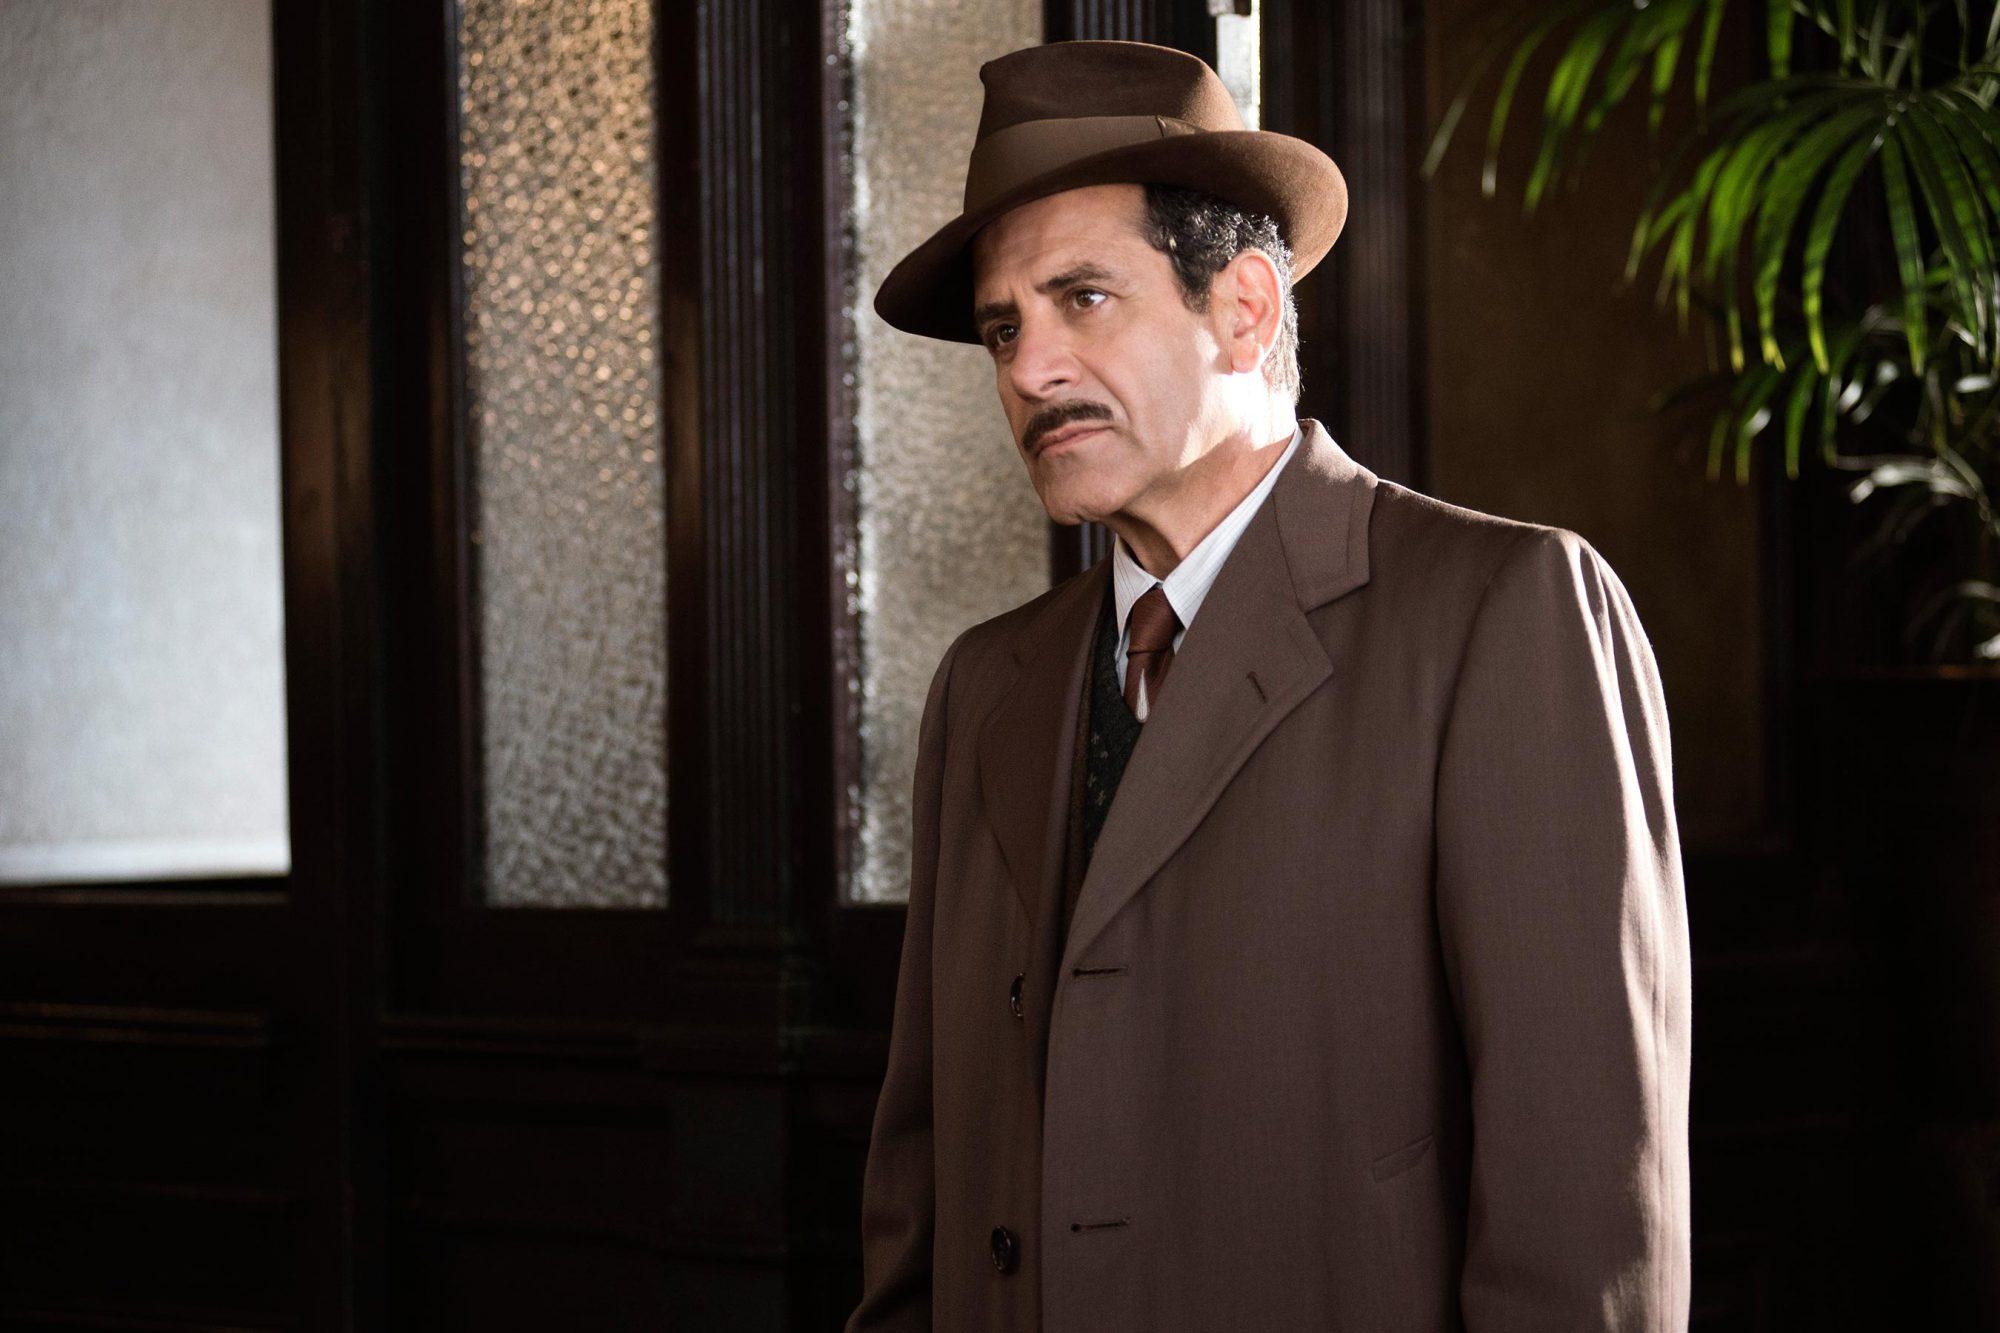 Tony Shalhoub in Season 1 of The Marvelous Mrs. Maisel.